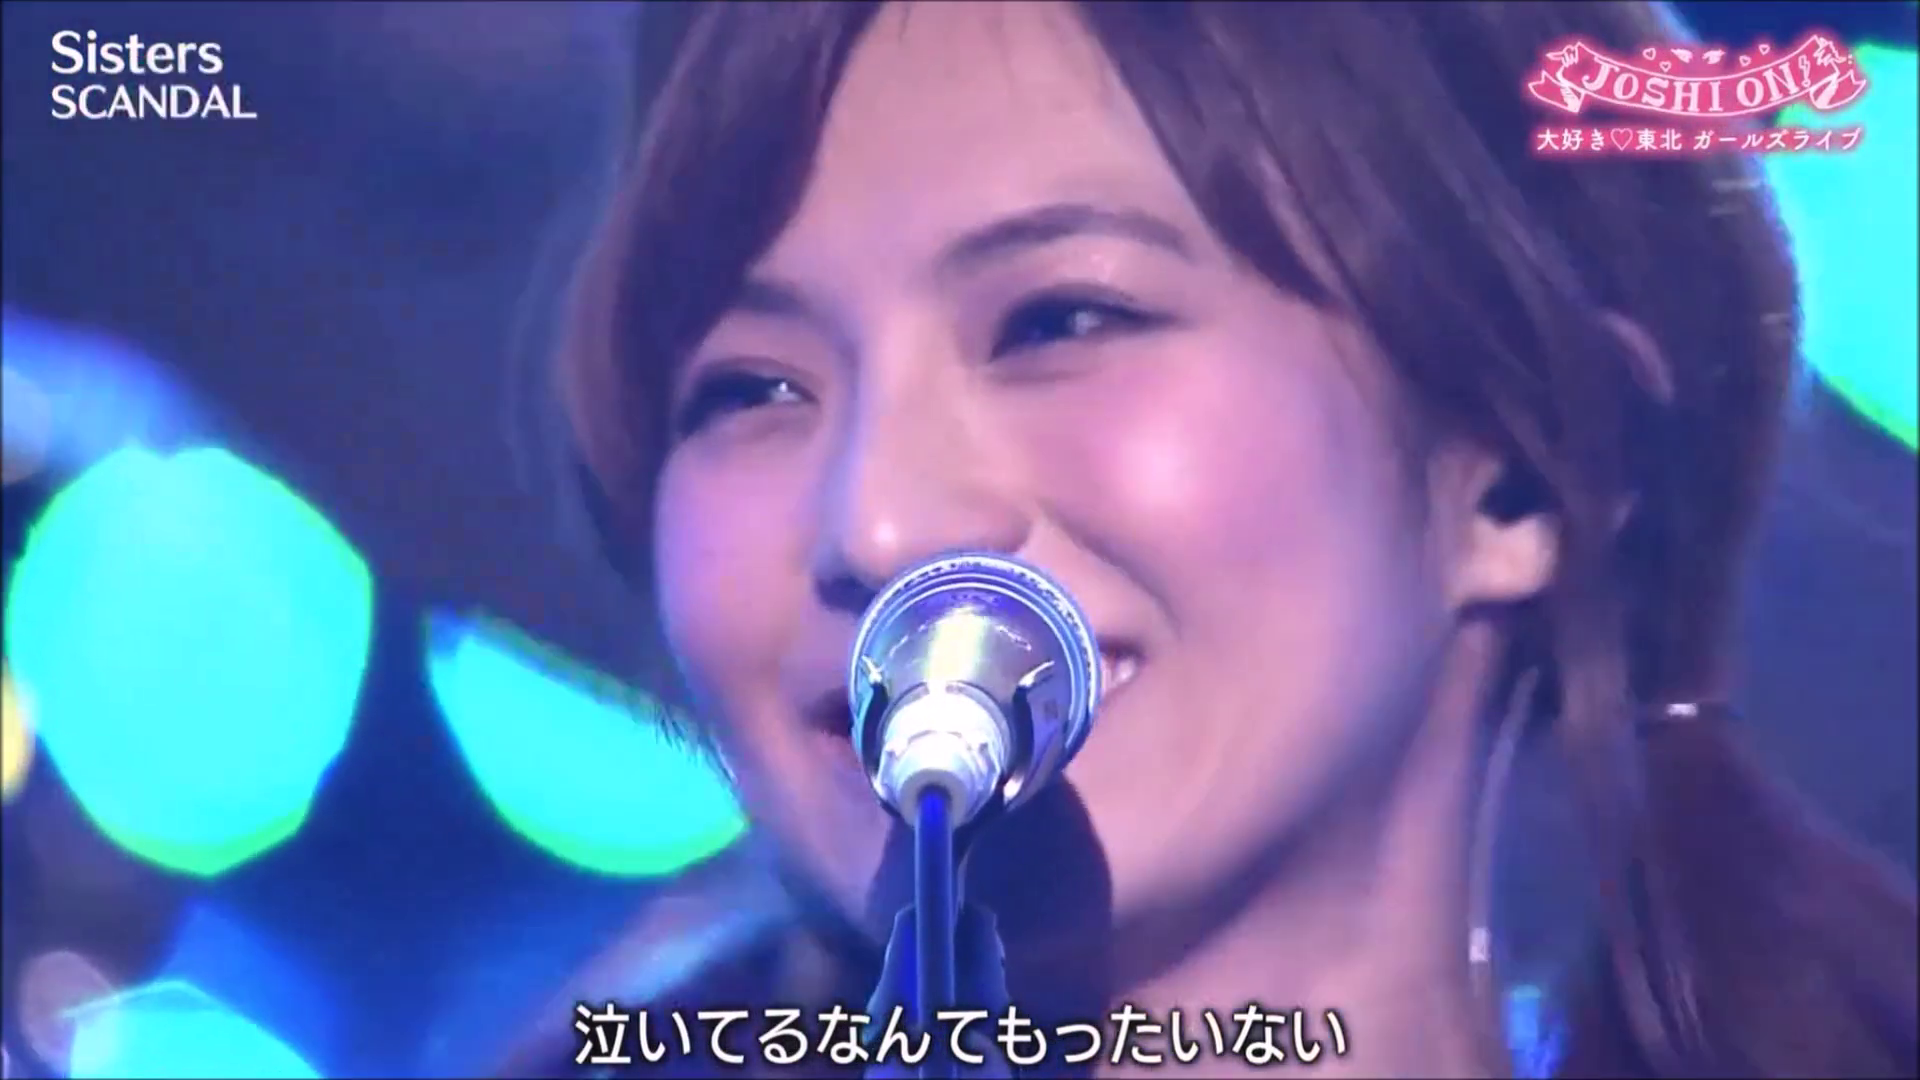 SCANDAL au Joshi On! ~Daisuki♡ Tohoku Girls Live~ sur NHK総合